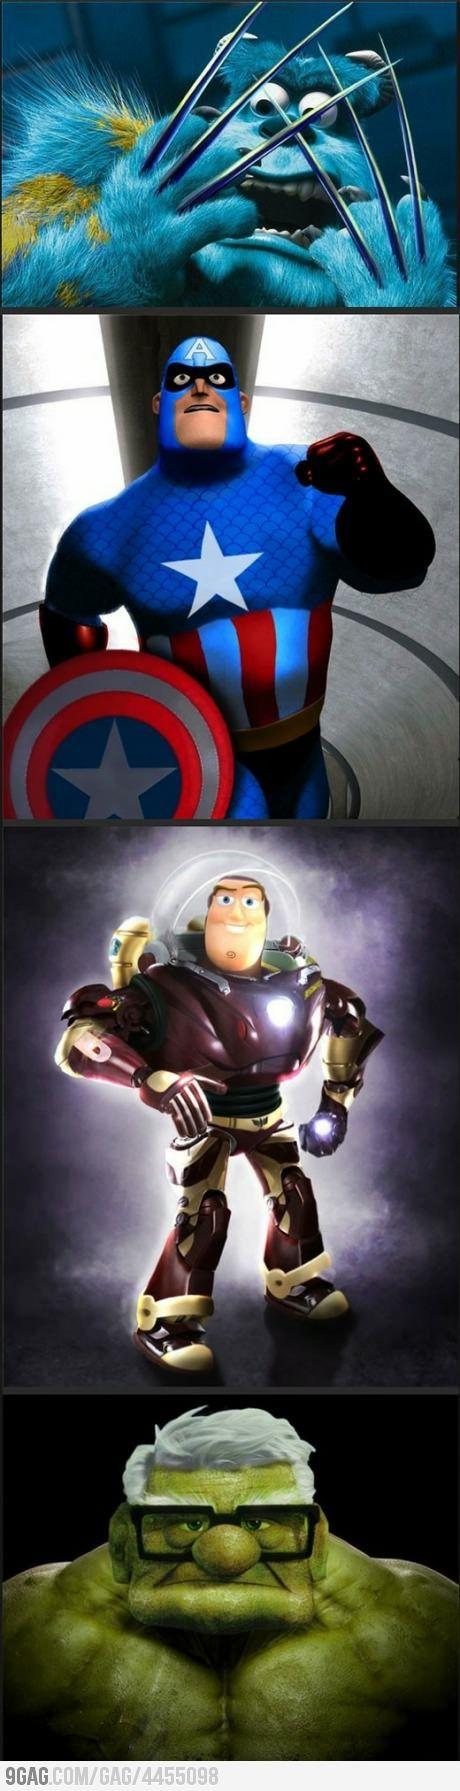 Pixar vs. Marvel: Pixar Marvel, Disney Marvel, Disney Pixar, Super Heroes, Disney Avengers, Disney Character, The Avengers, Marvel Heroes, Superhero